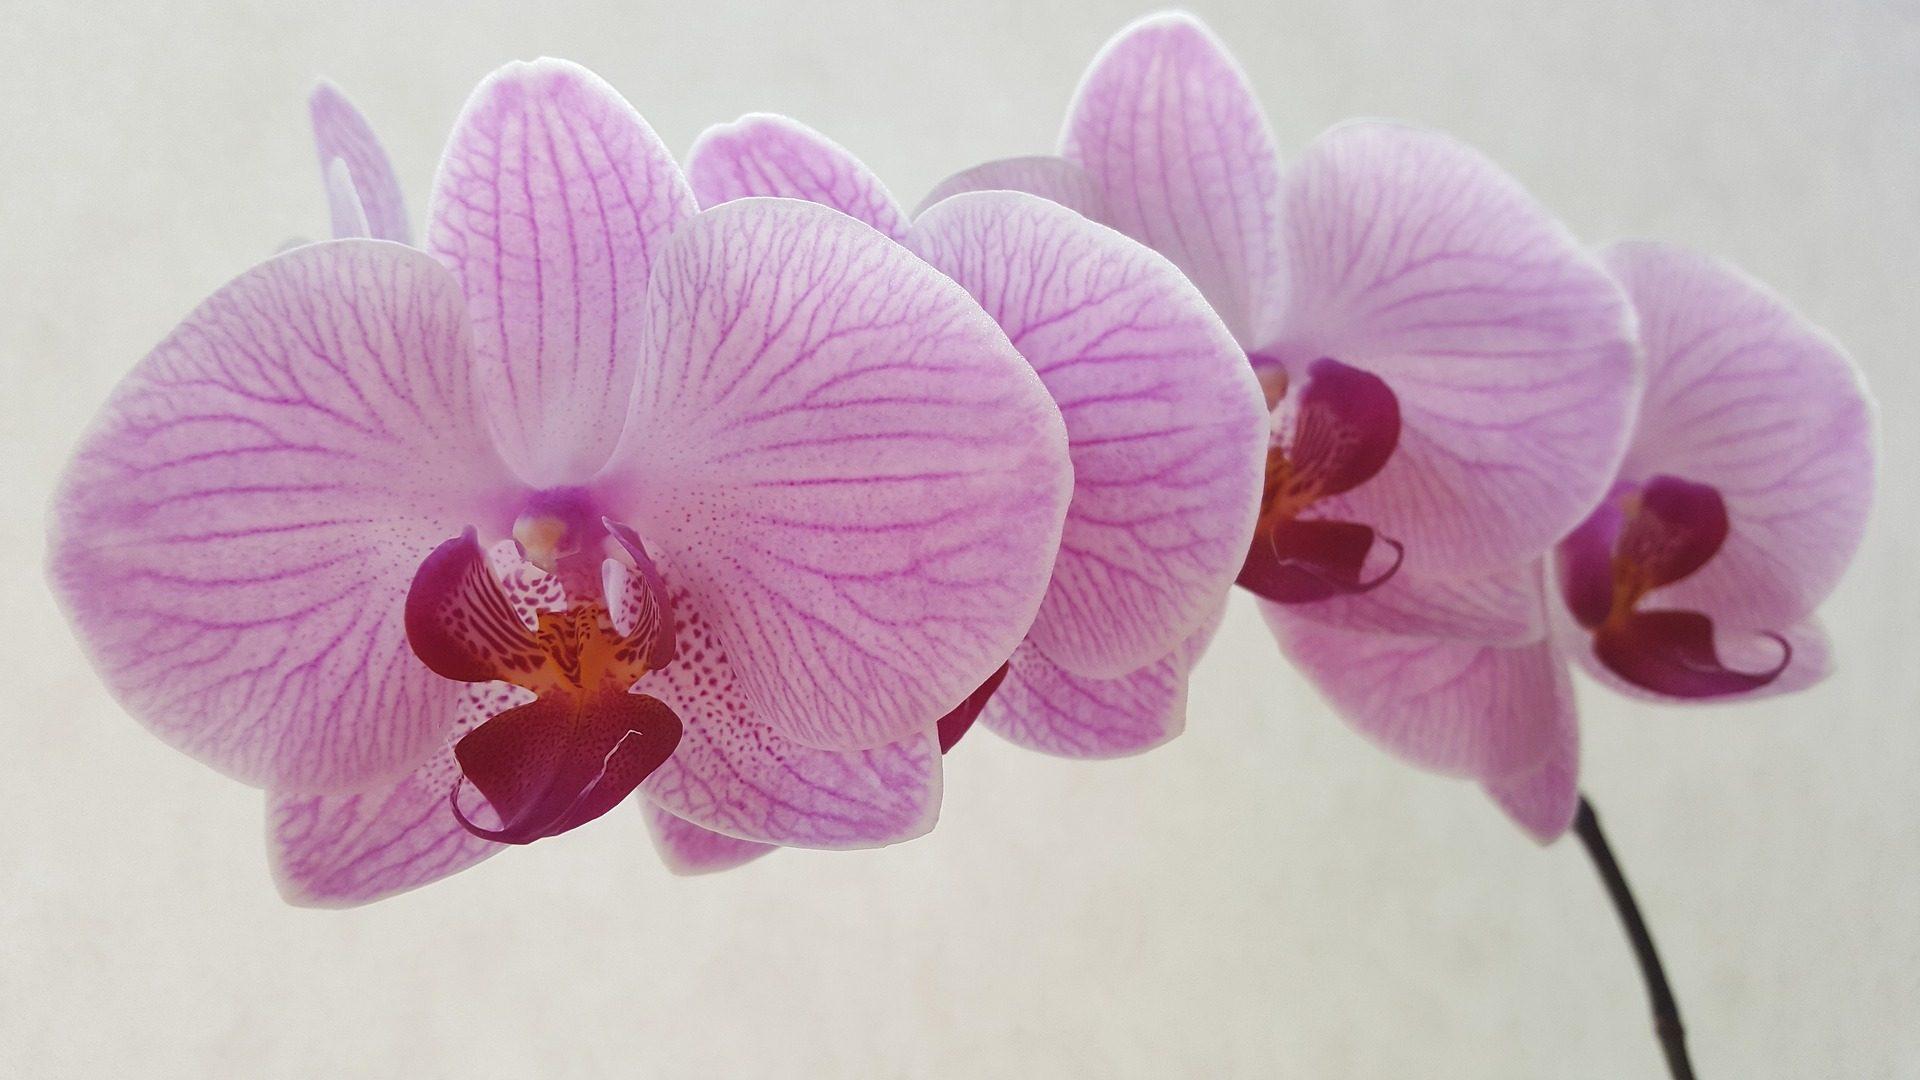 orquídeas, flores, haste, Rosa, sobre - Papéis de parede HD - Professor-falken.com